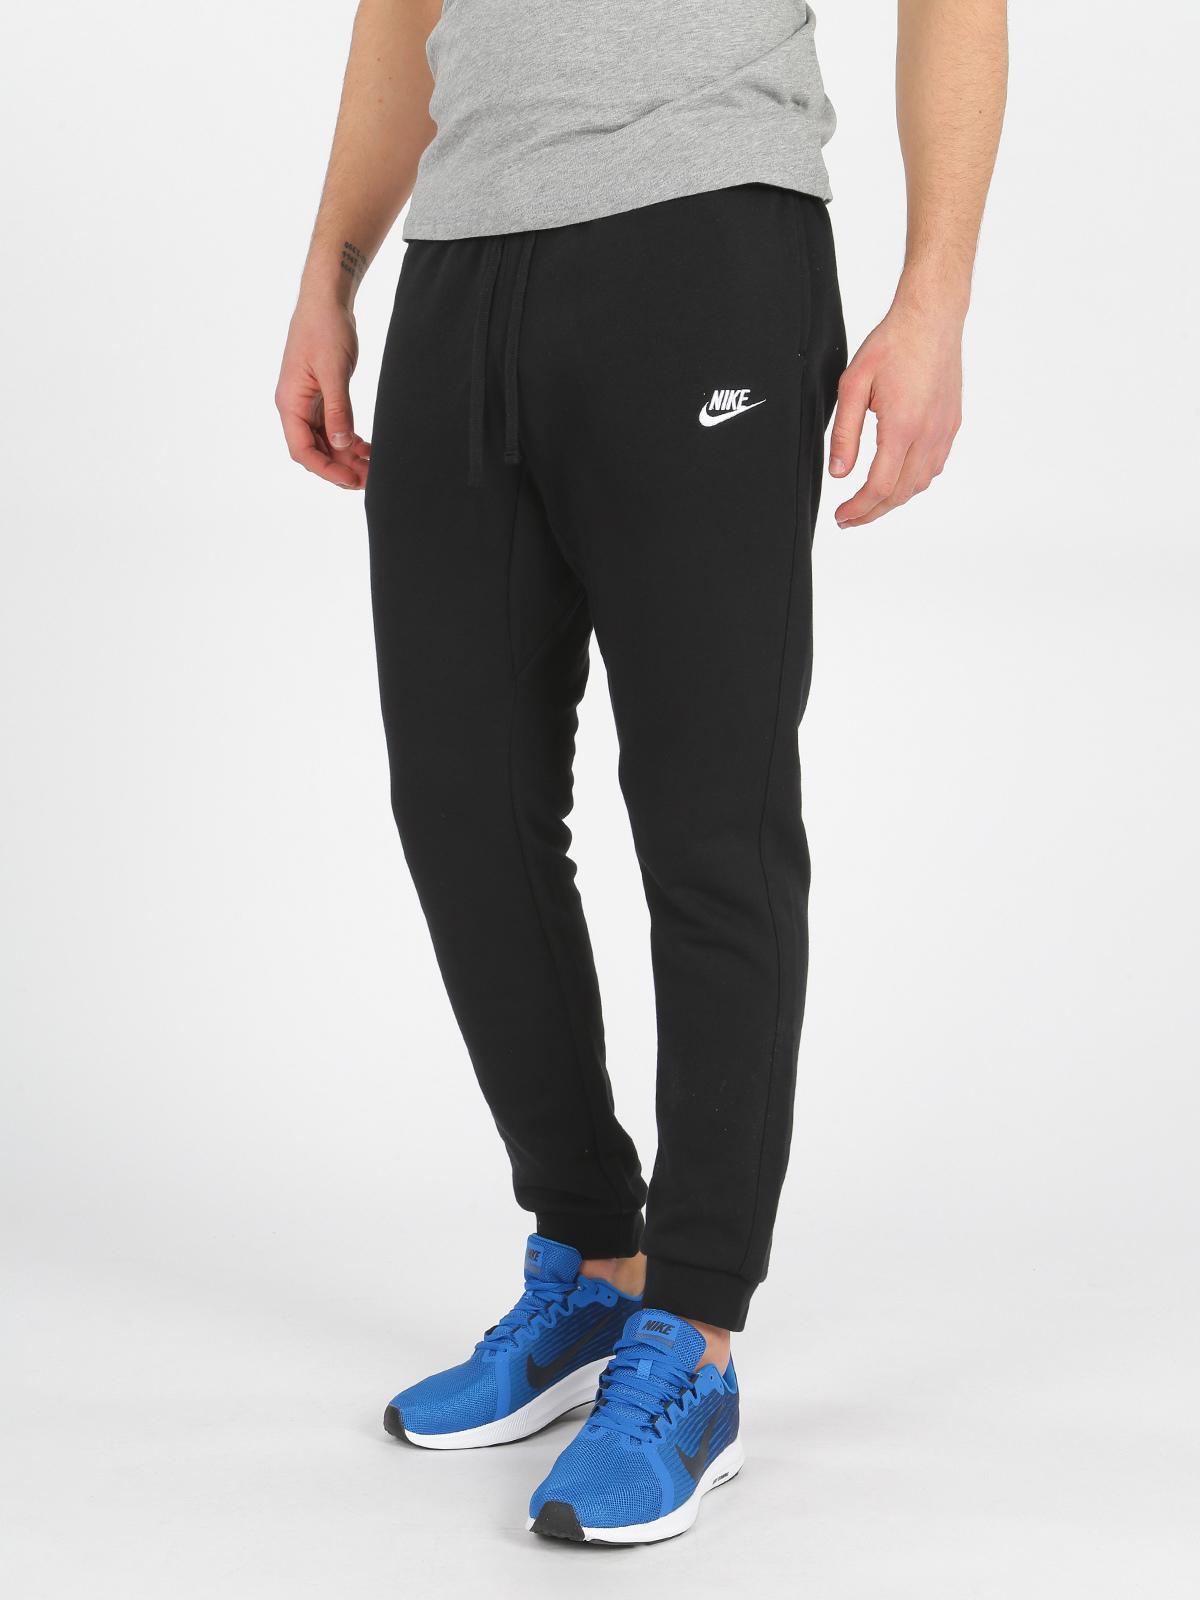 Pantalones Deportivos Negros Deportivos Nike Sportswear Jogger Hombre Mecshopping